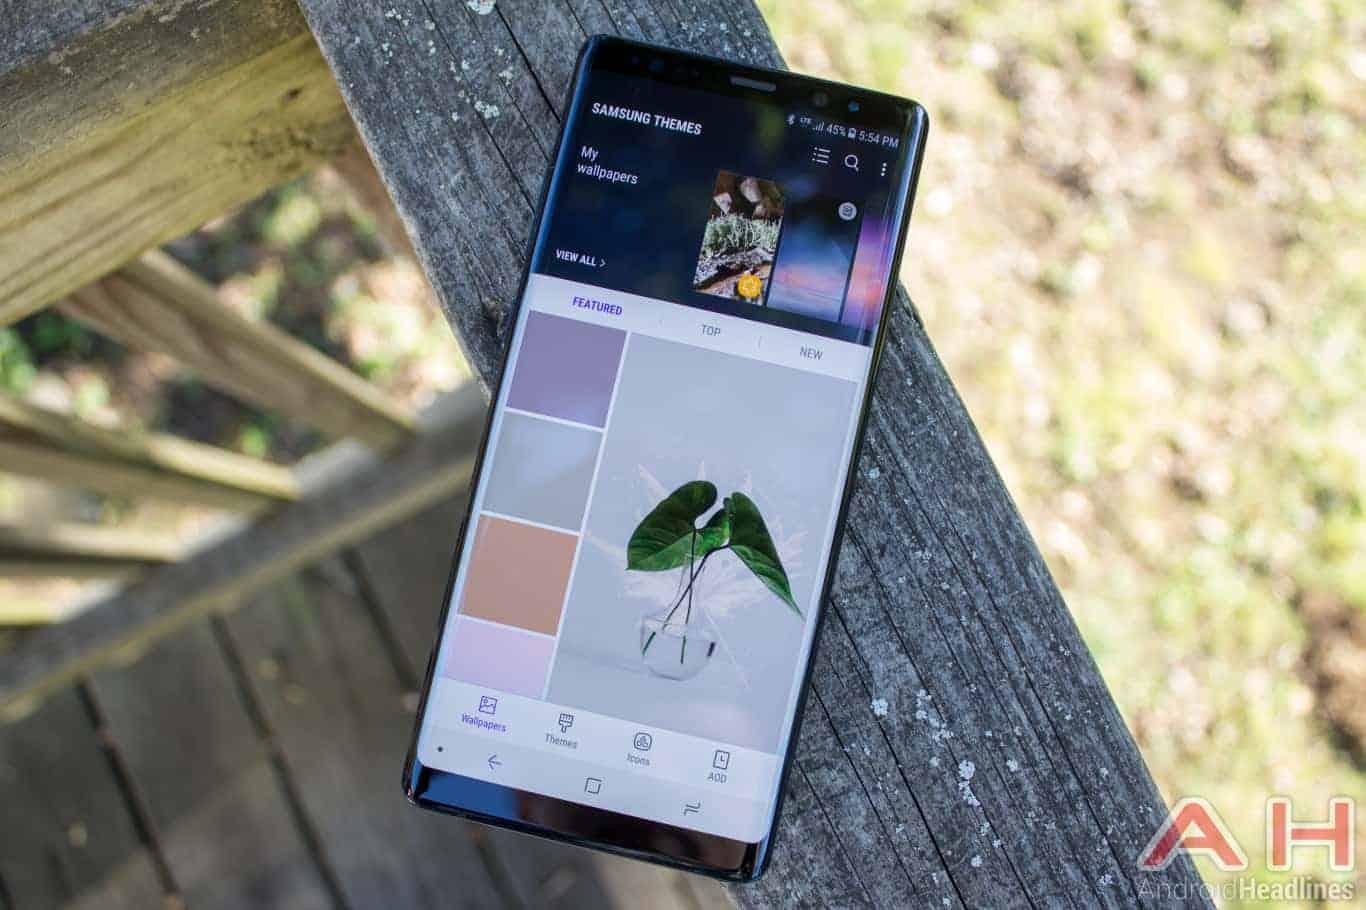 Phone Comparisons: Samsung Galaxy Note 8 vs Galaxy Note 5 ...